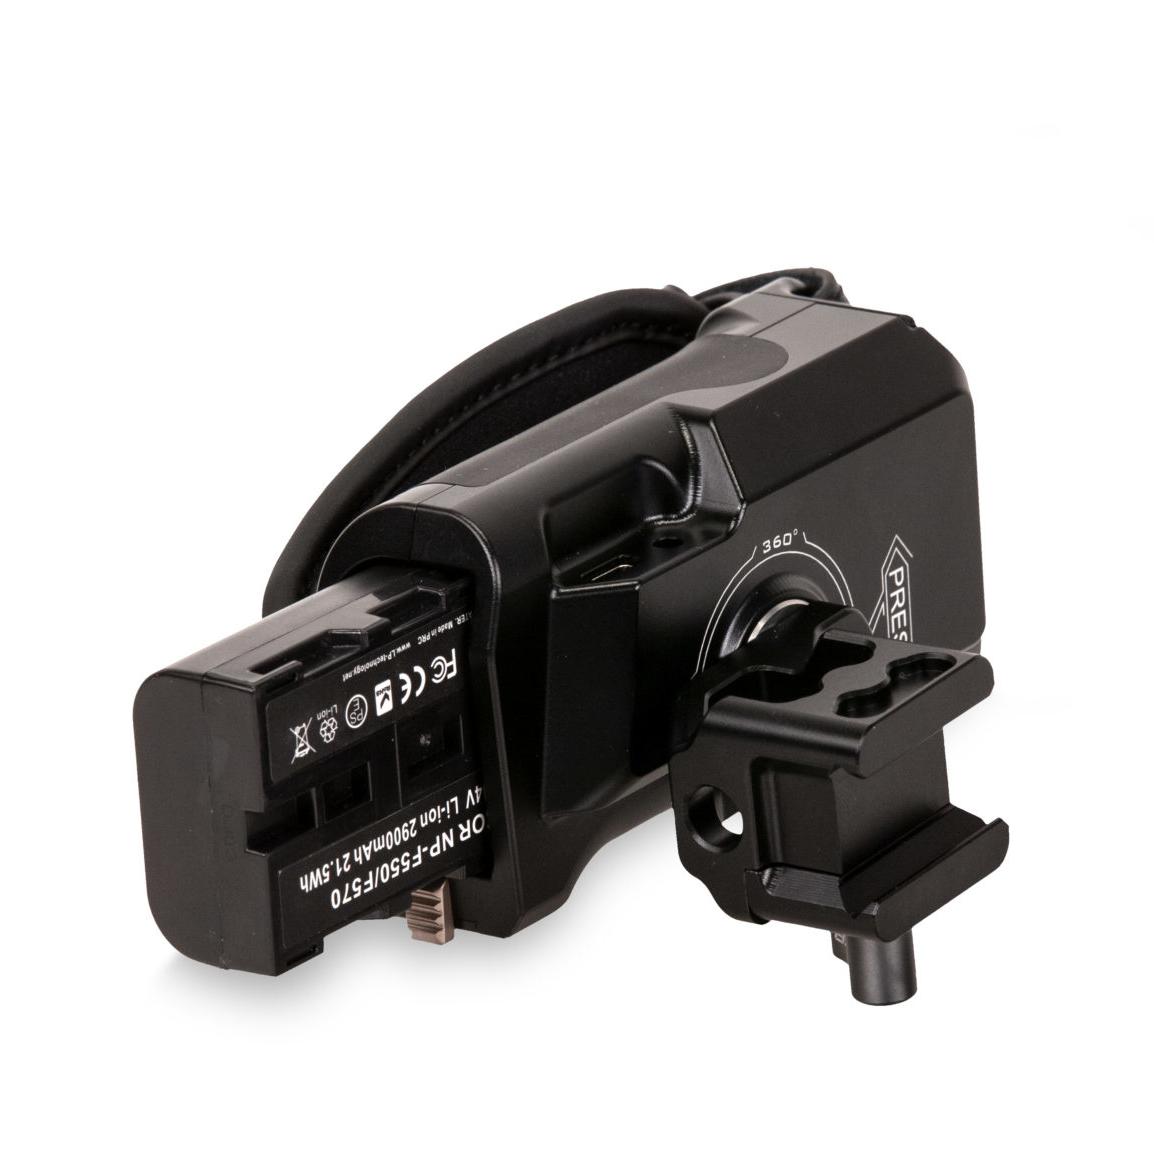 tilta-TA-LRH6-57-B-left-side-advanced-run-stop-handle-r%C4%85czka-steruj%C4%85ca-03.jpg